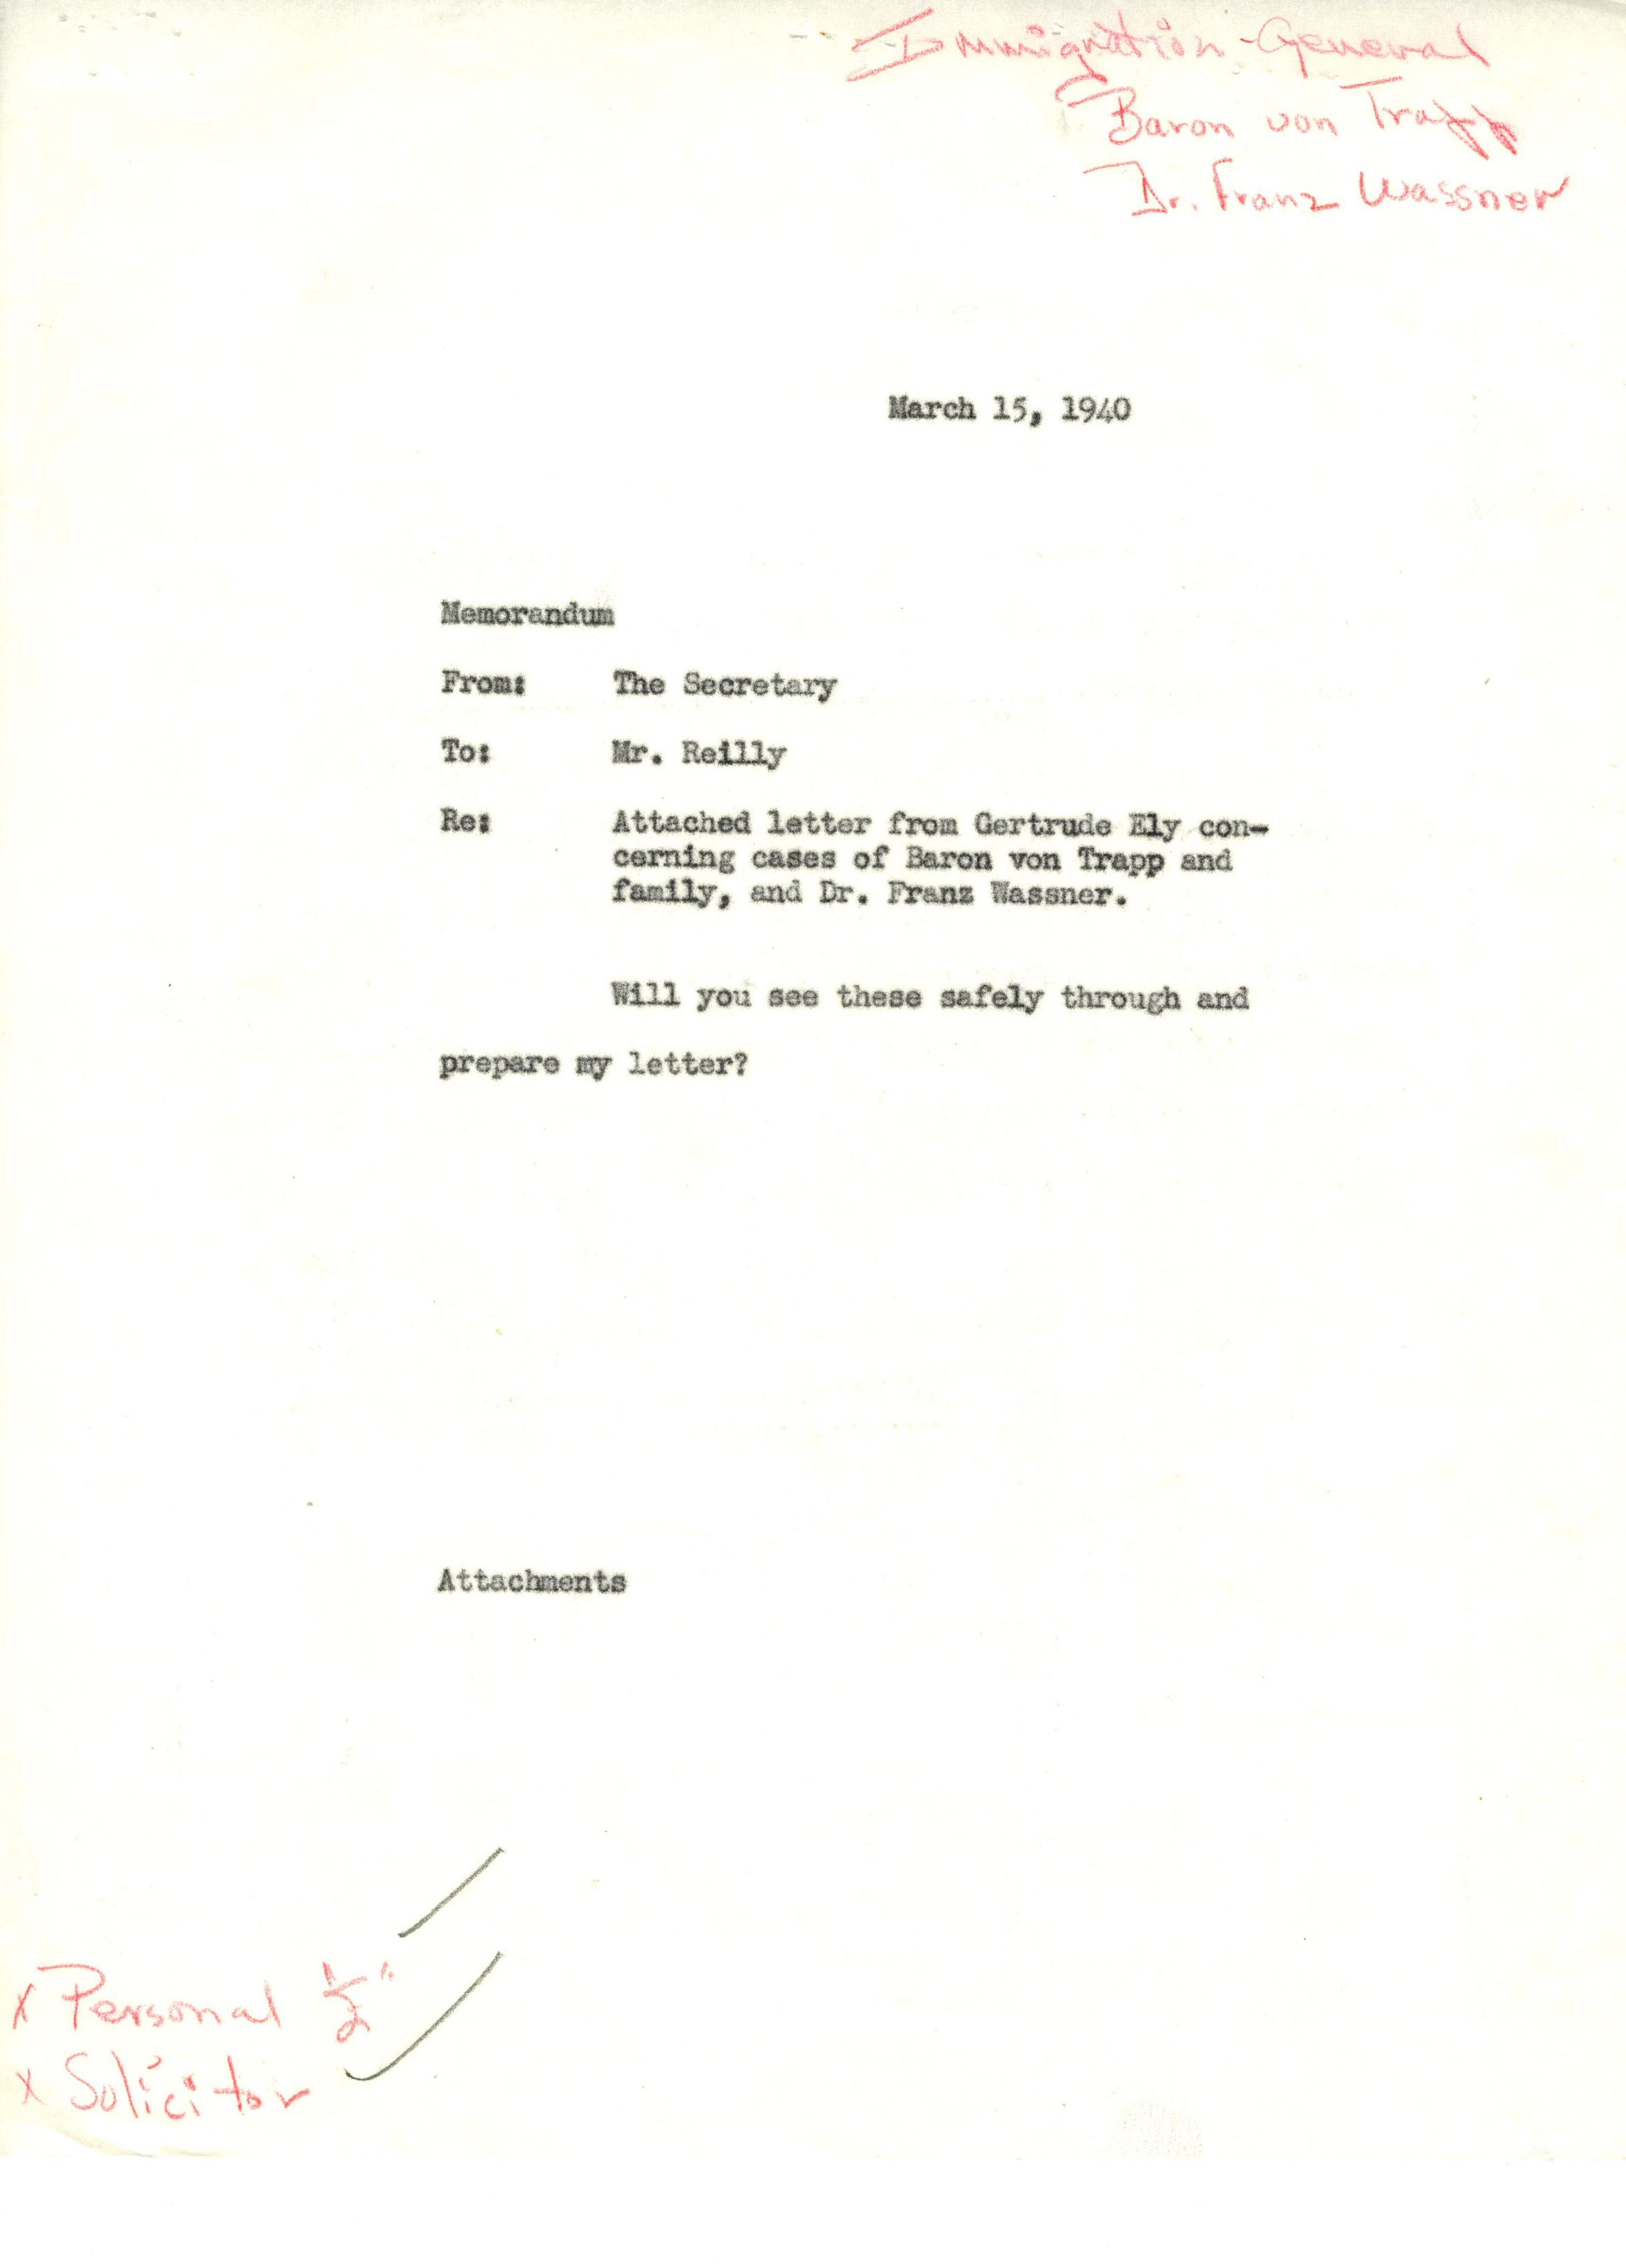 Immigration Records 1970s Box Folder